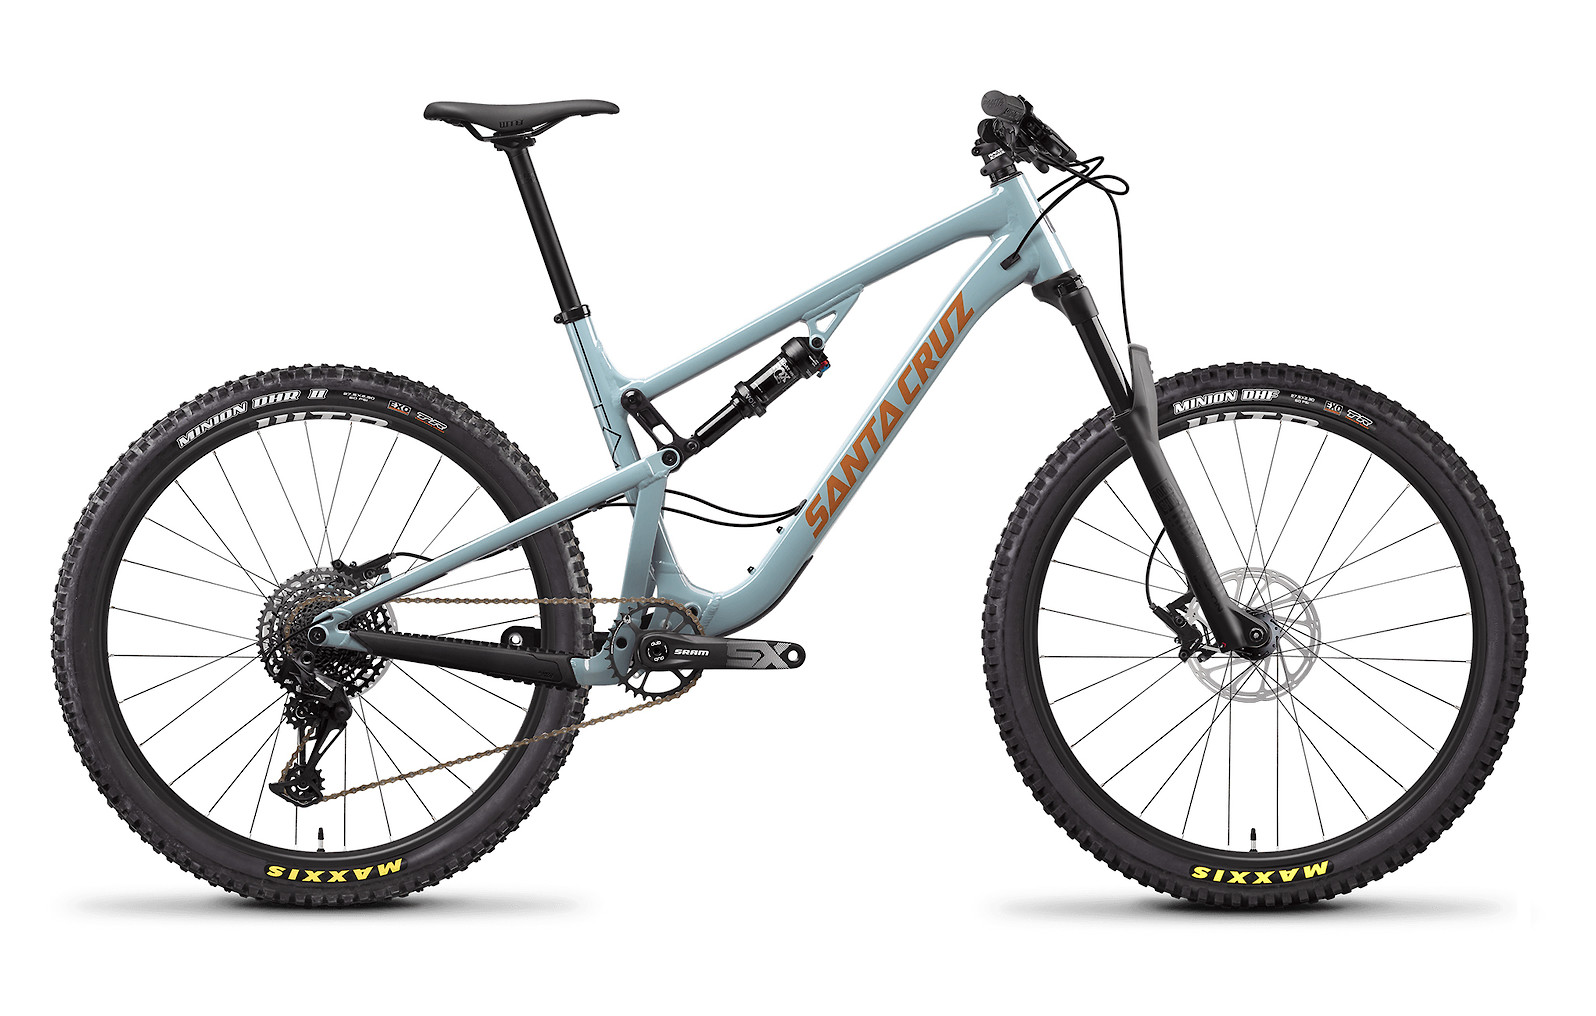 2020 Santa Cruz 5010 Aluminum D (Regular Build, Robins Egg and Orange)